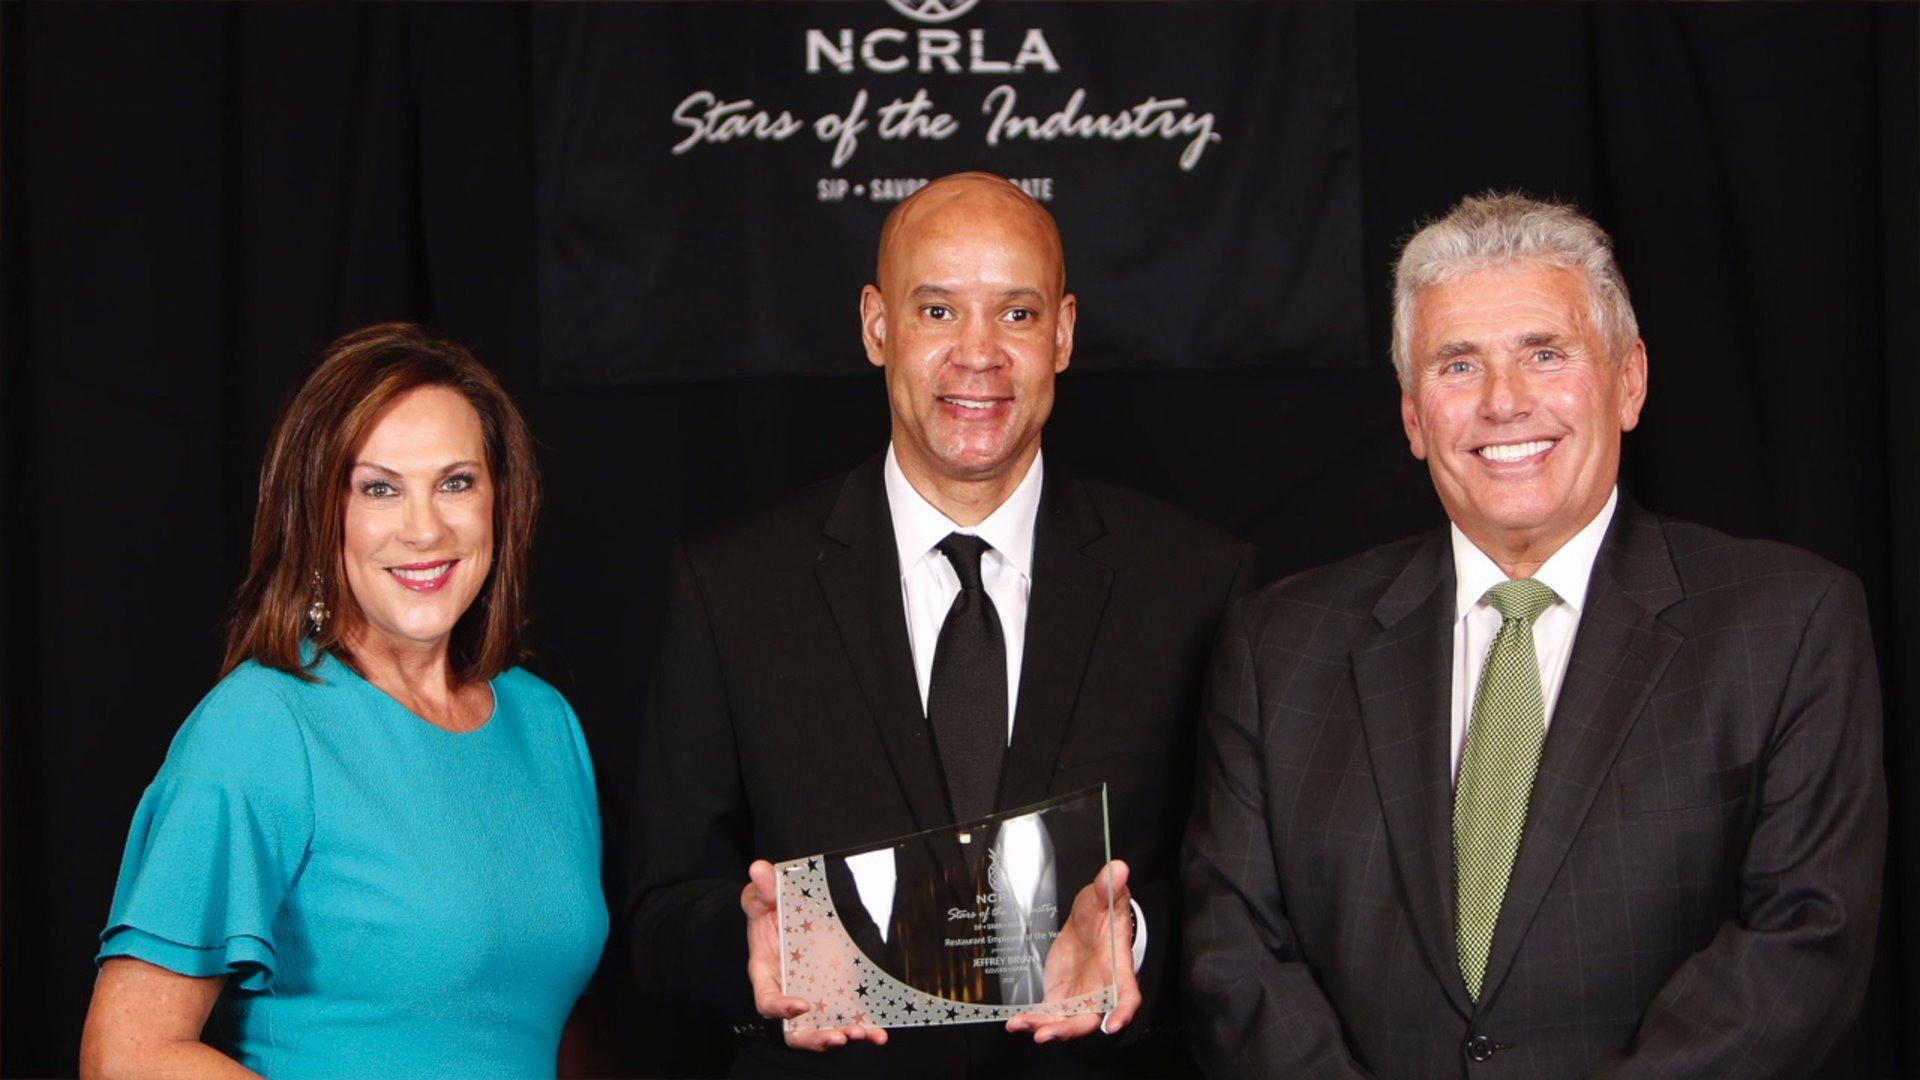 Winston-Salem Golden Corral employee overcomes health scare, wins state award